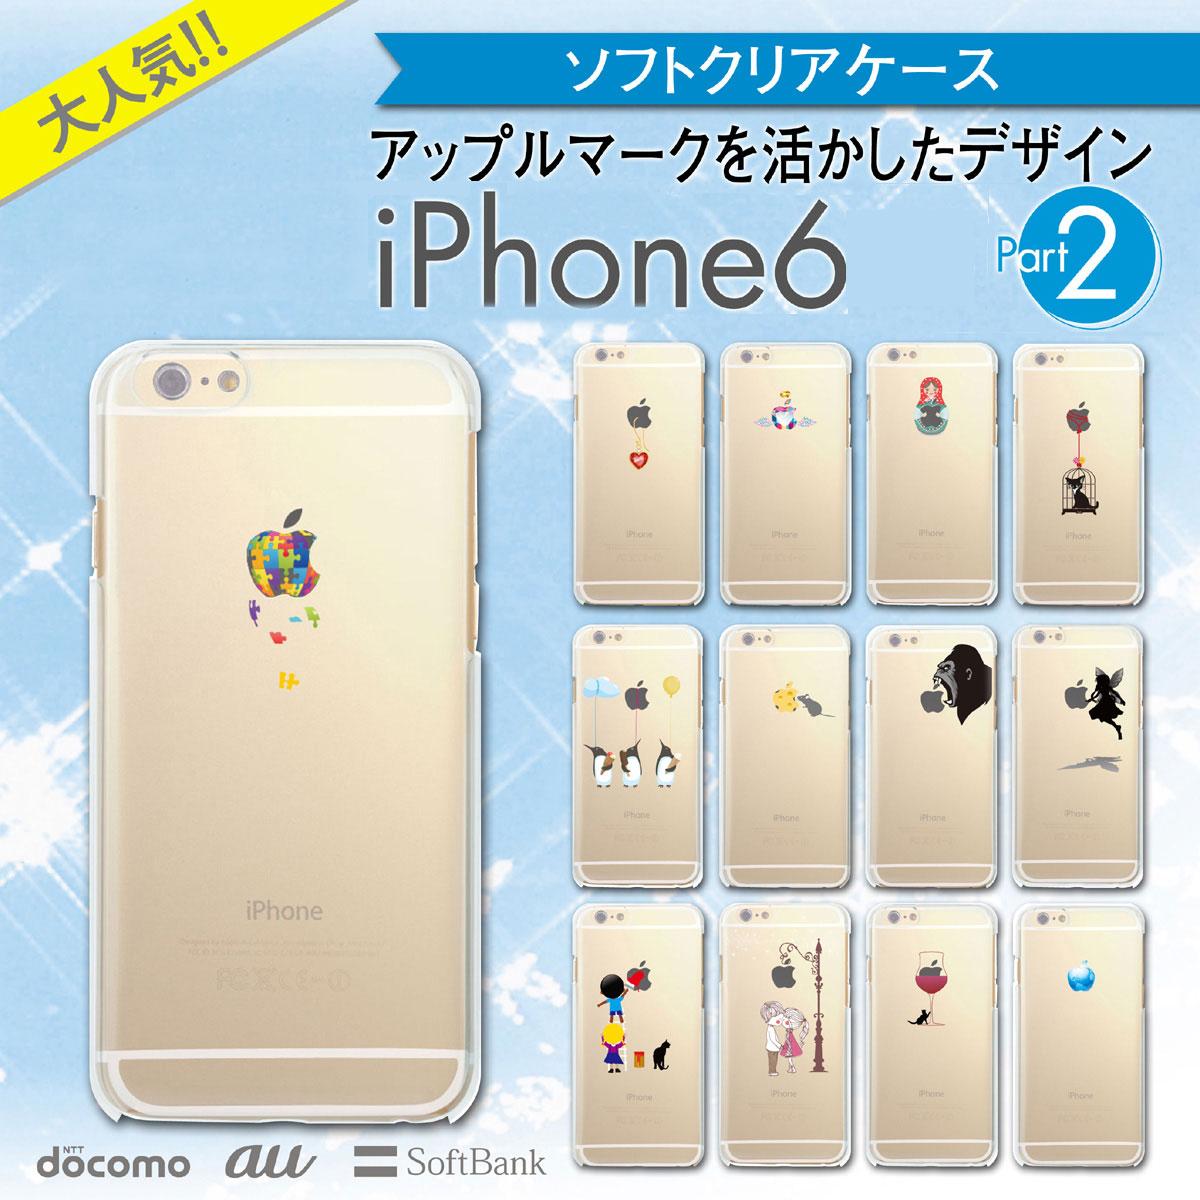 iPhone6 Plus 4.7 5.5 ケース カバー Clear Arts スマホケース iPhone アイフォン6 クリアケース クリアカバー クリアーアーツ ソフトケース イラスト 着せ替え 97-ip6-tp002